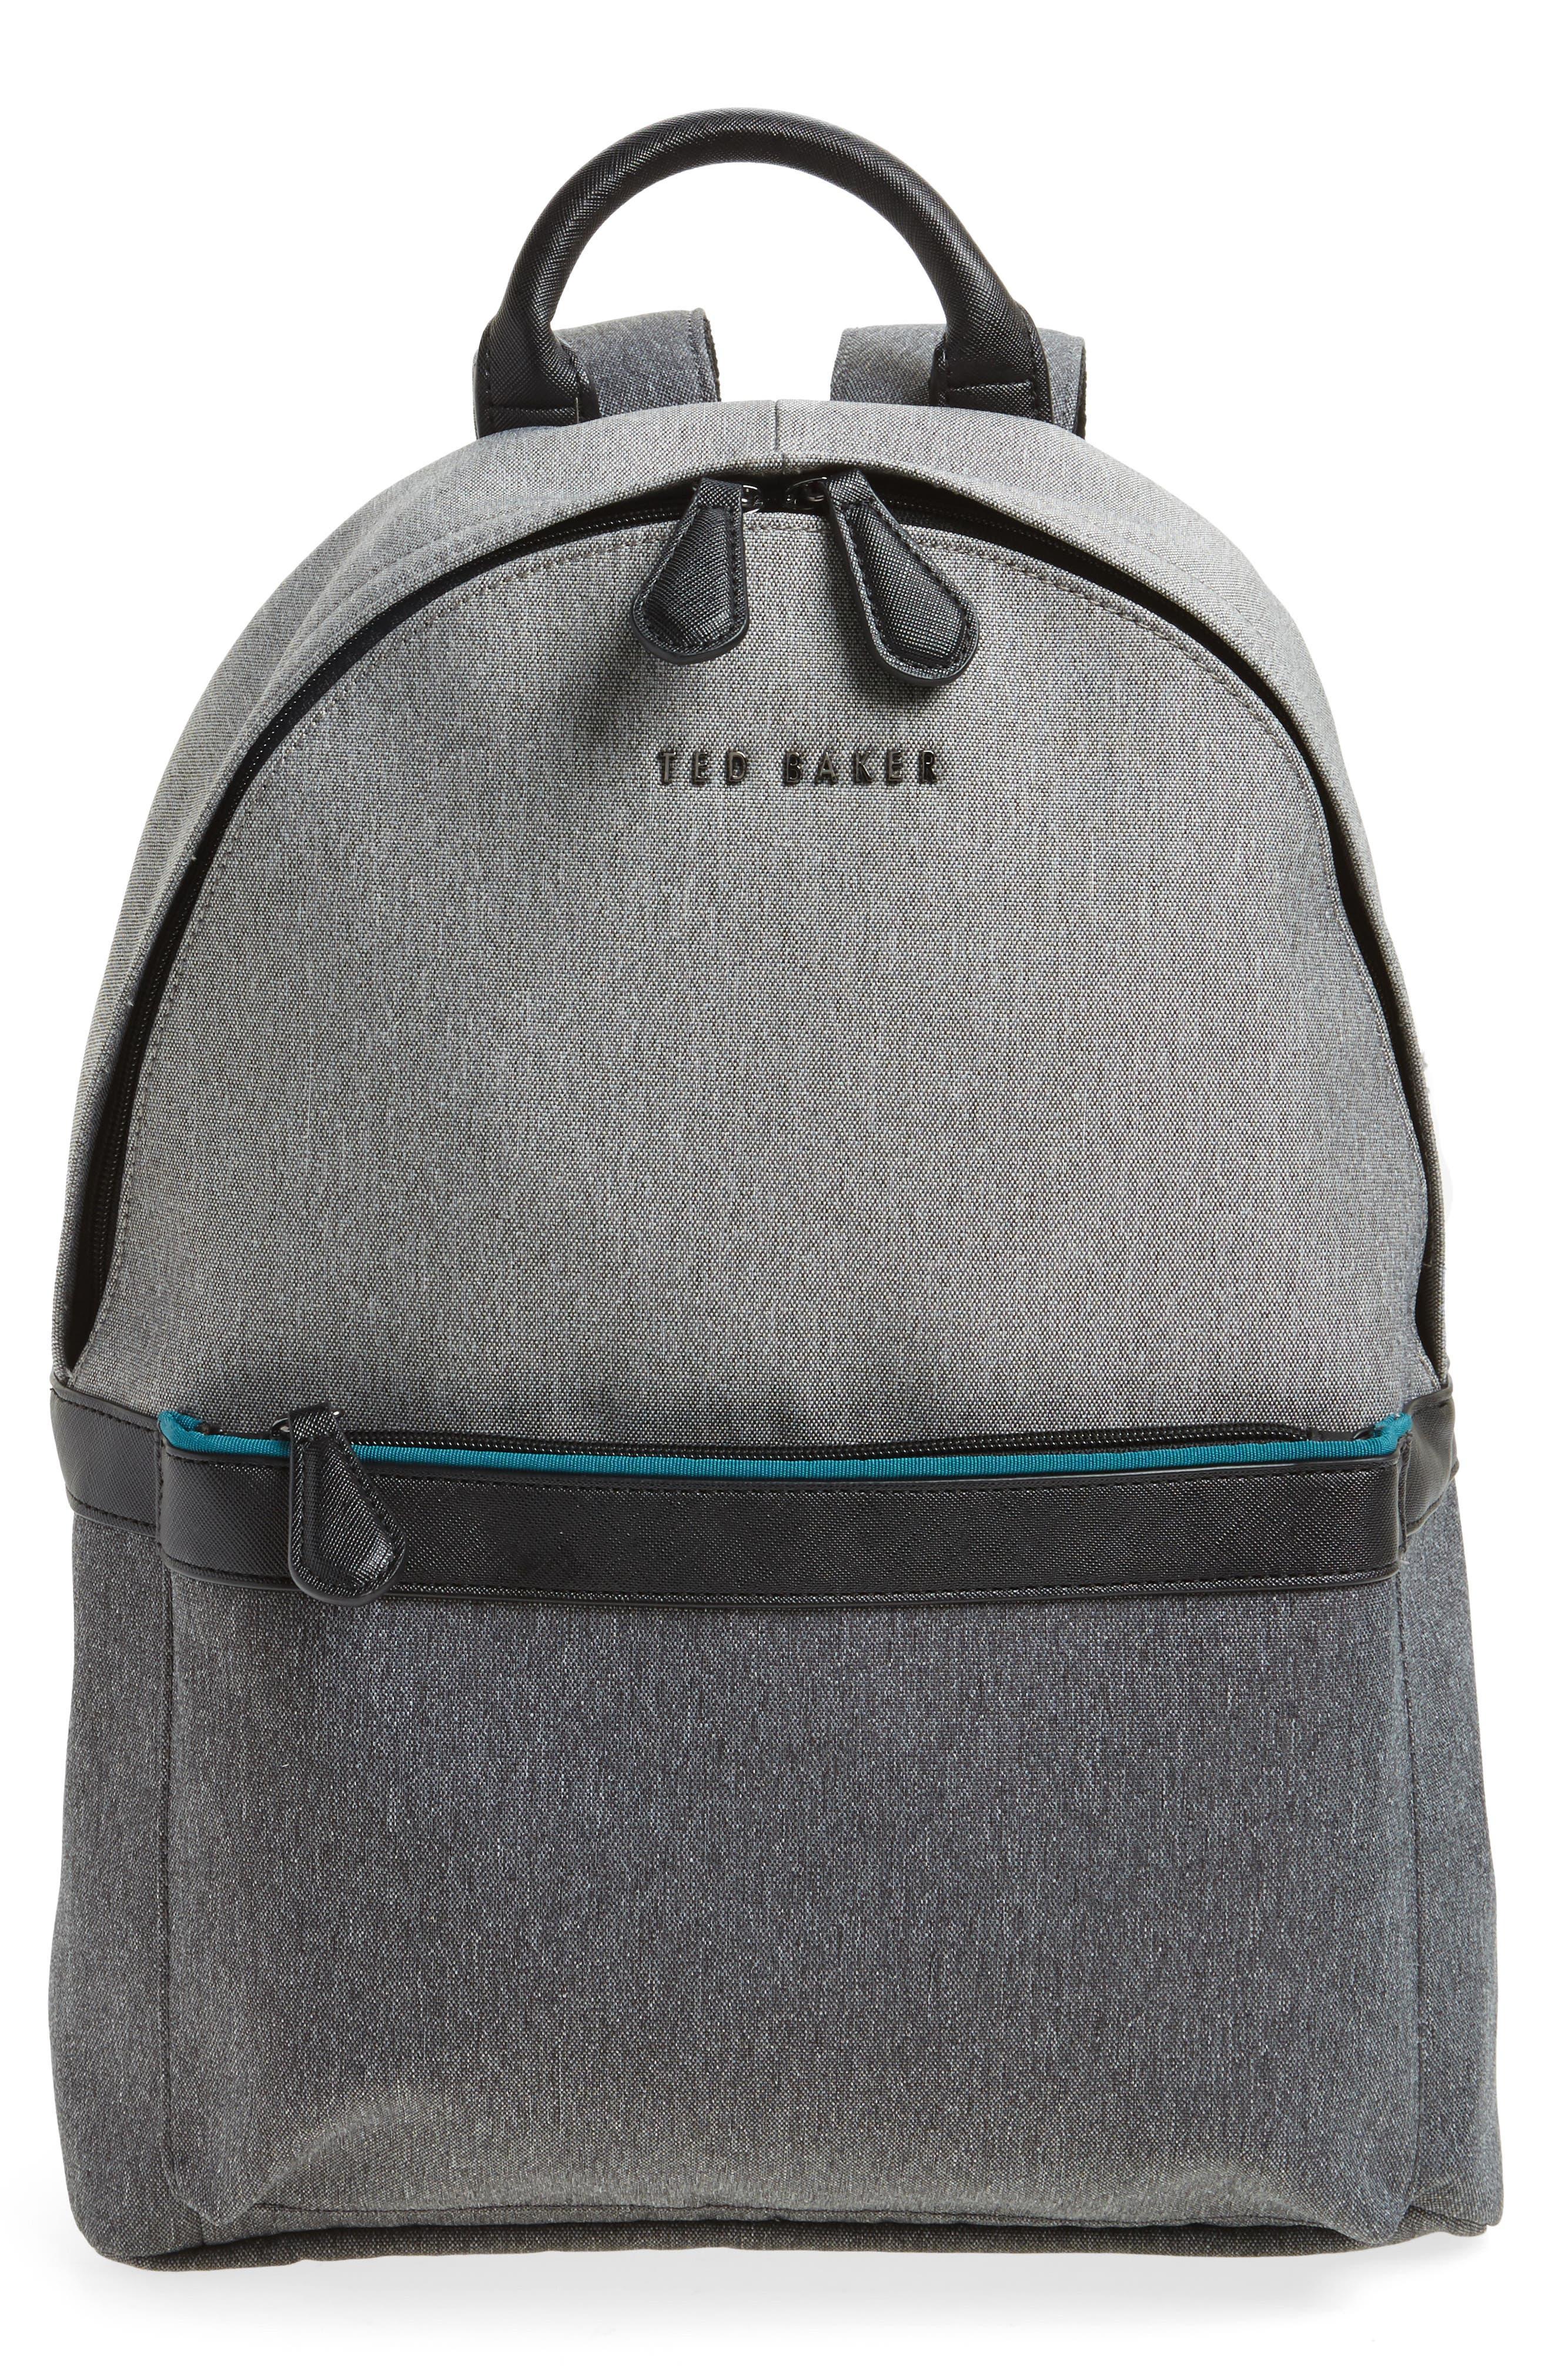 Zirabi Backpack,                             Main thumbnail 1, color,                             030